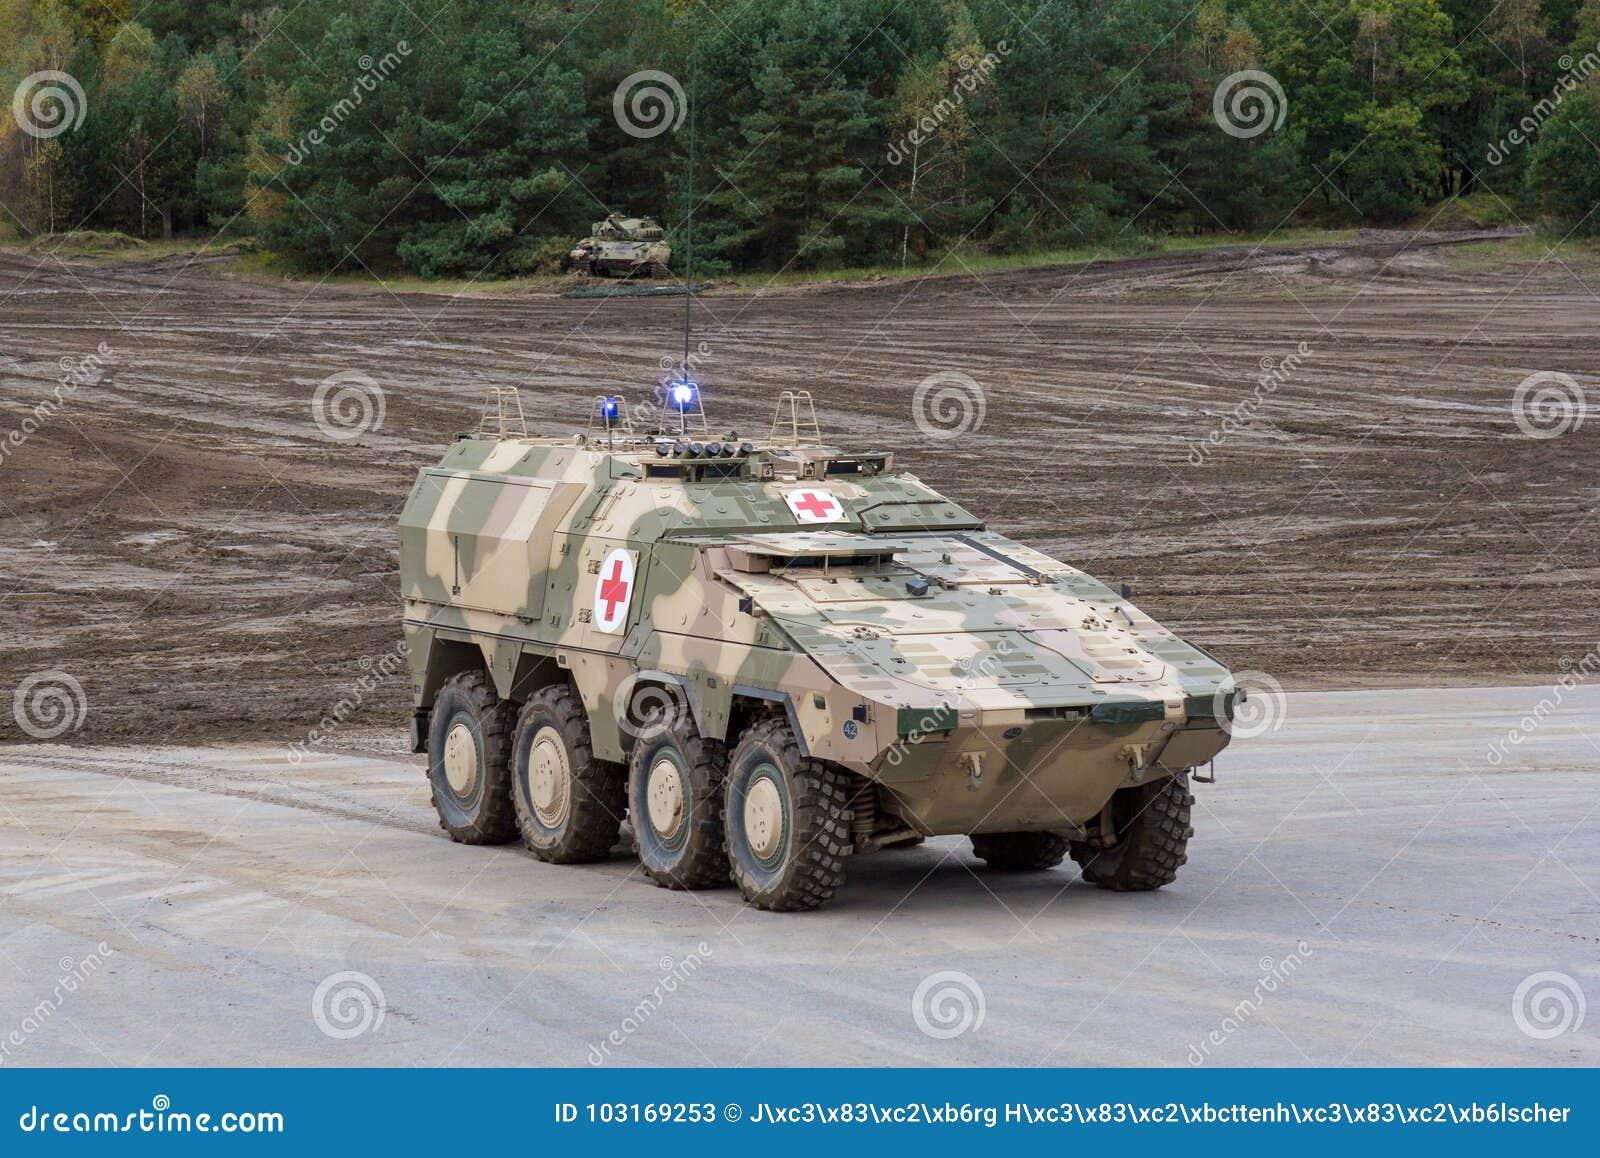 German GTK Boxer, Medic Version From Kmw And Rheinmetall